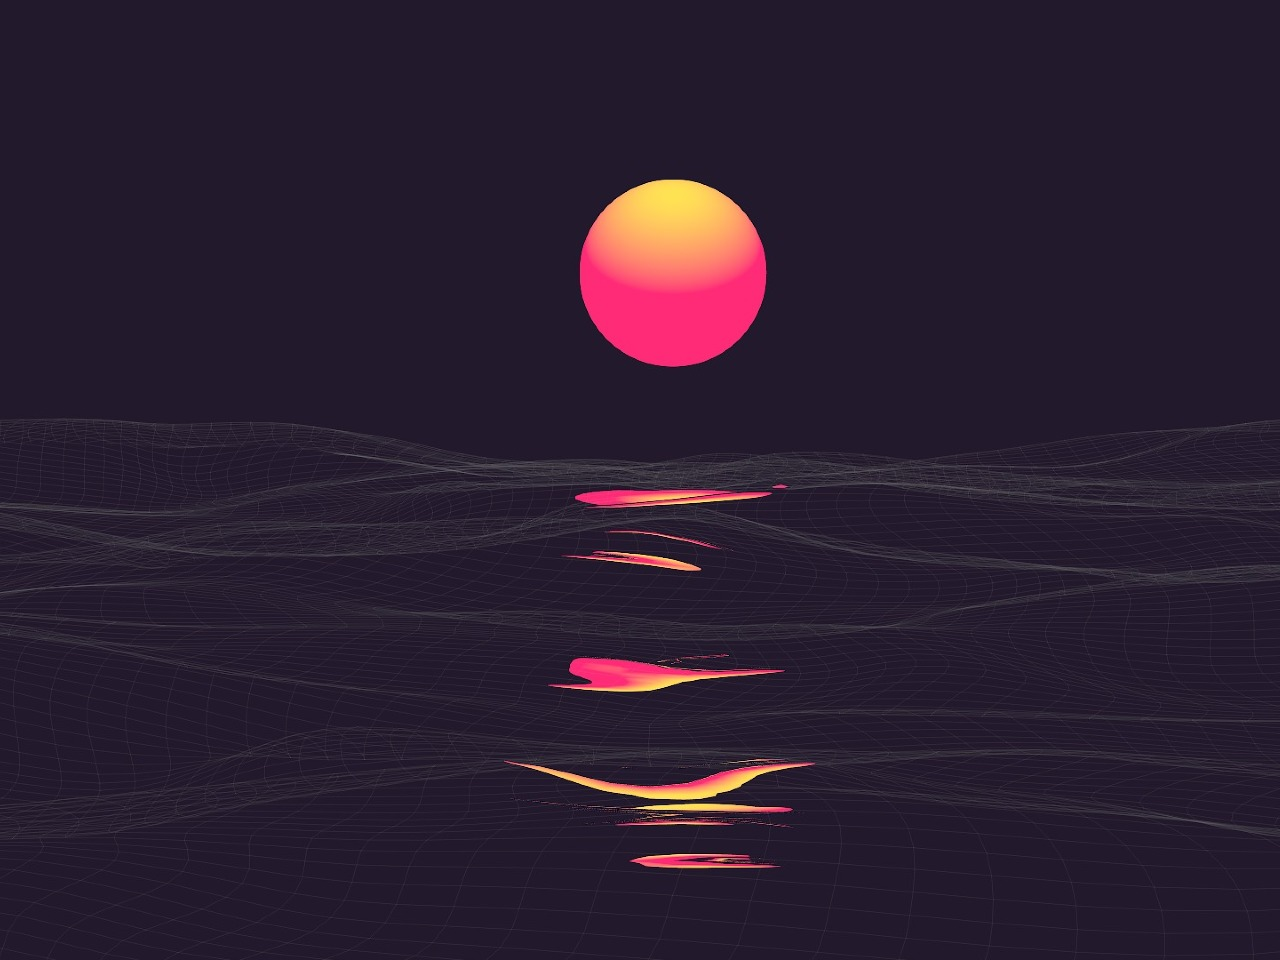 Abstract Vaporwave Retrowave Sun Reflaction, Full HD Wallpaper